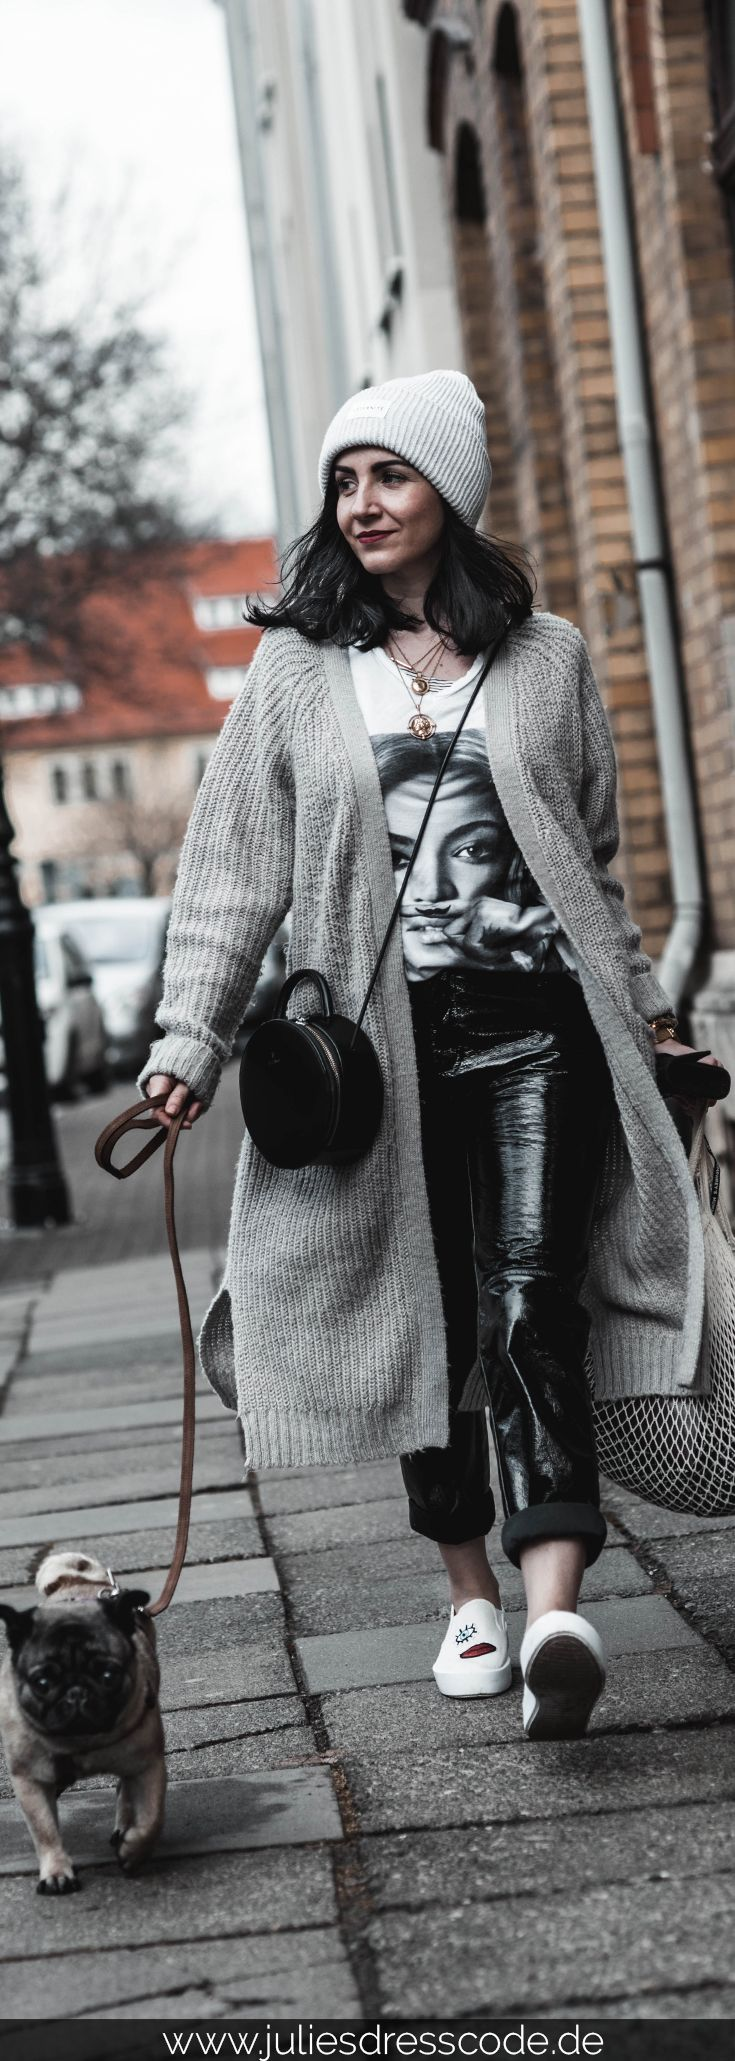 So tragen wir Vinyl-Pants im Frühling – Julies Dresscode | Fashion Trends, Outfits & Streetstyles